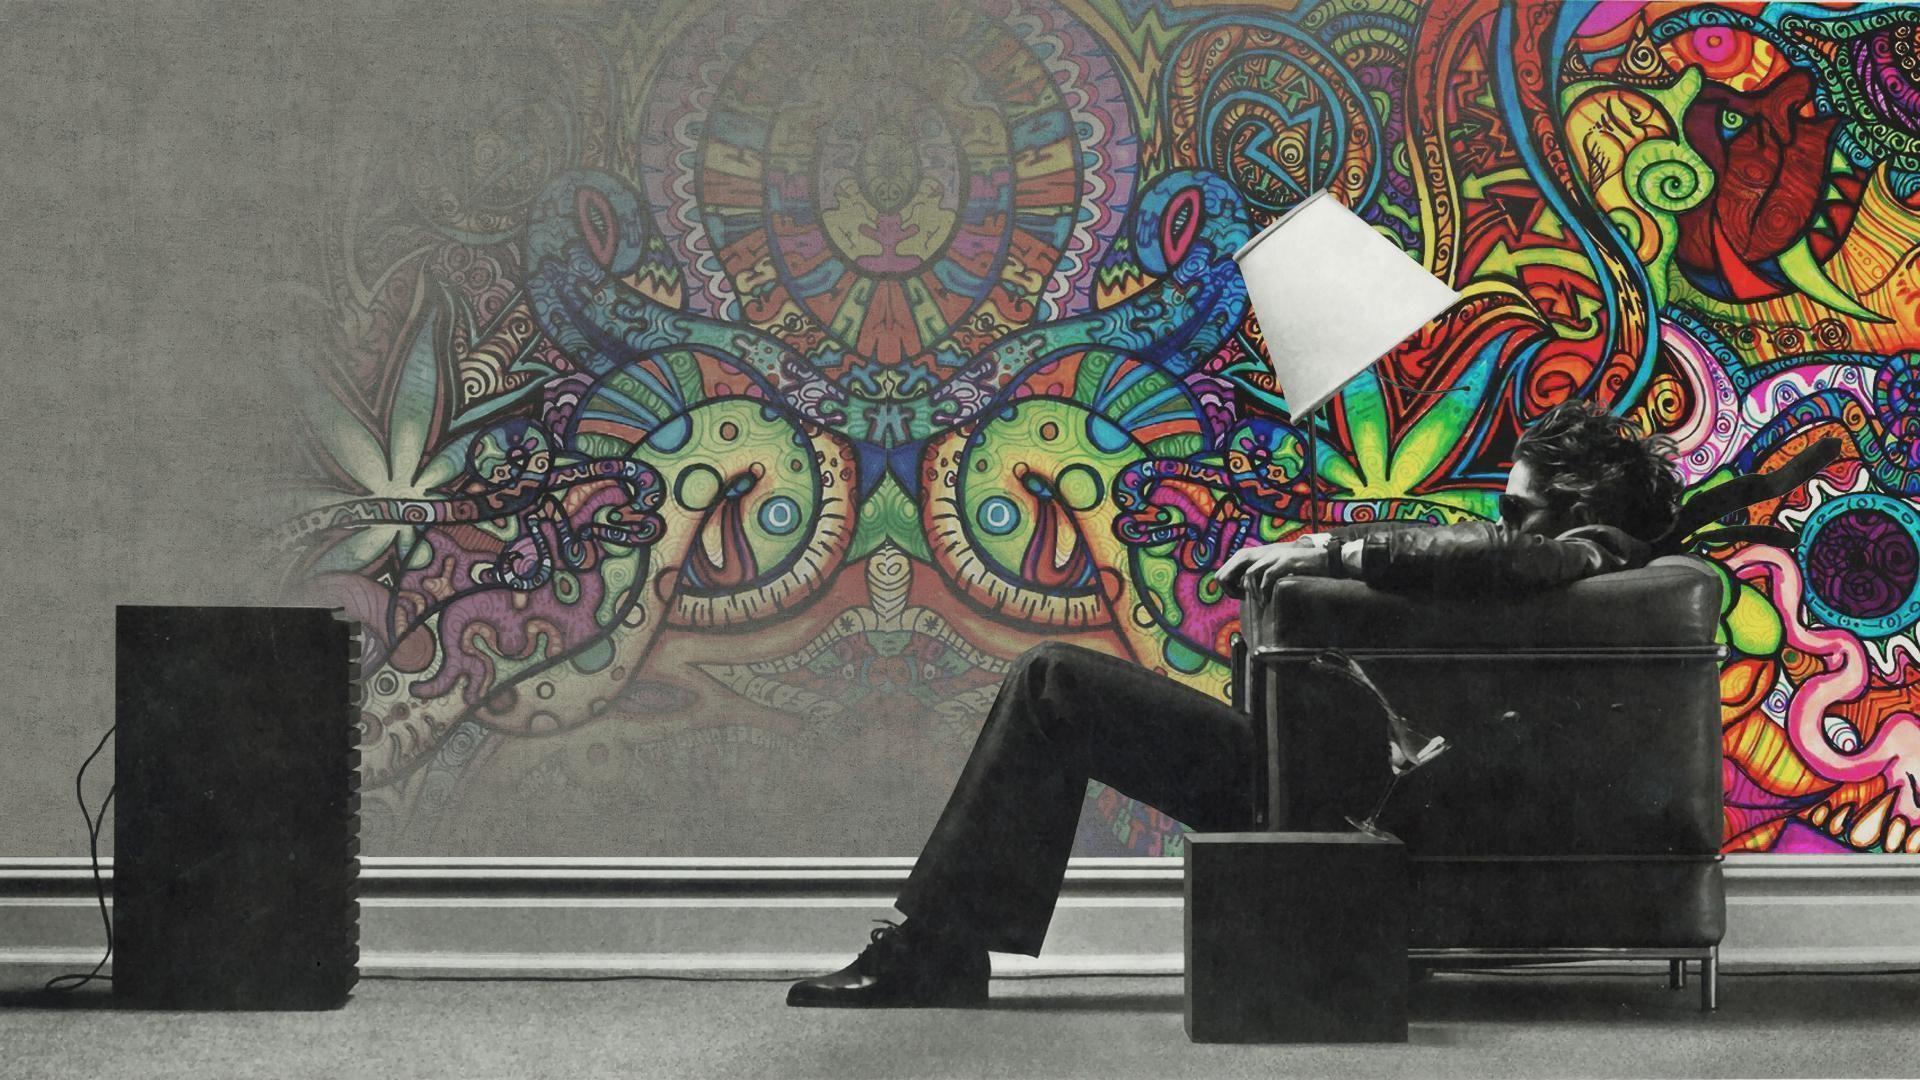 Psychedelic Desktop Wallpaper HD – WallpaperSafari